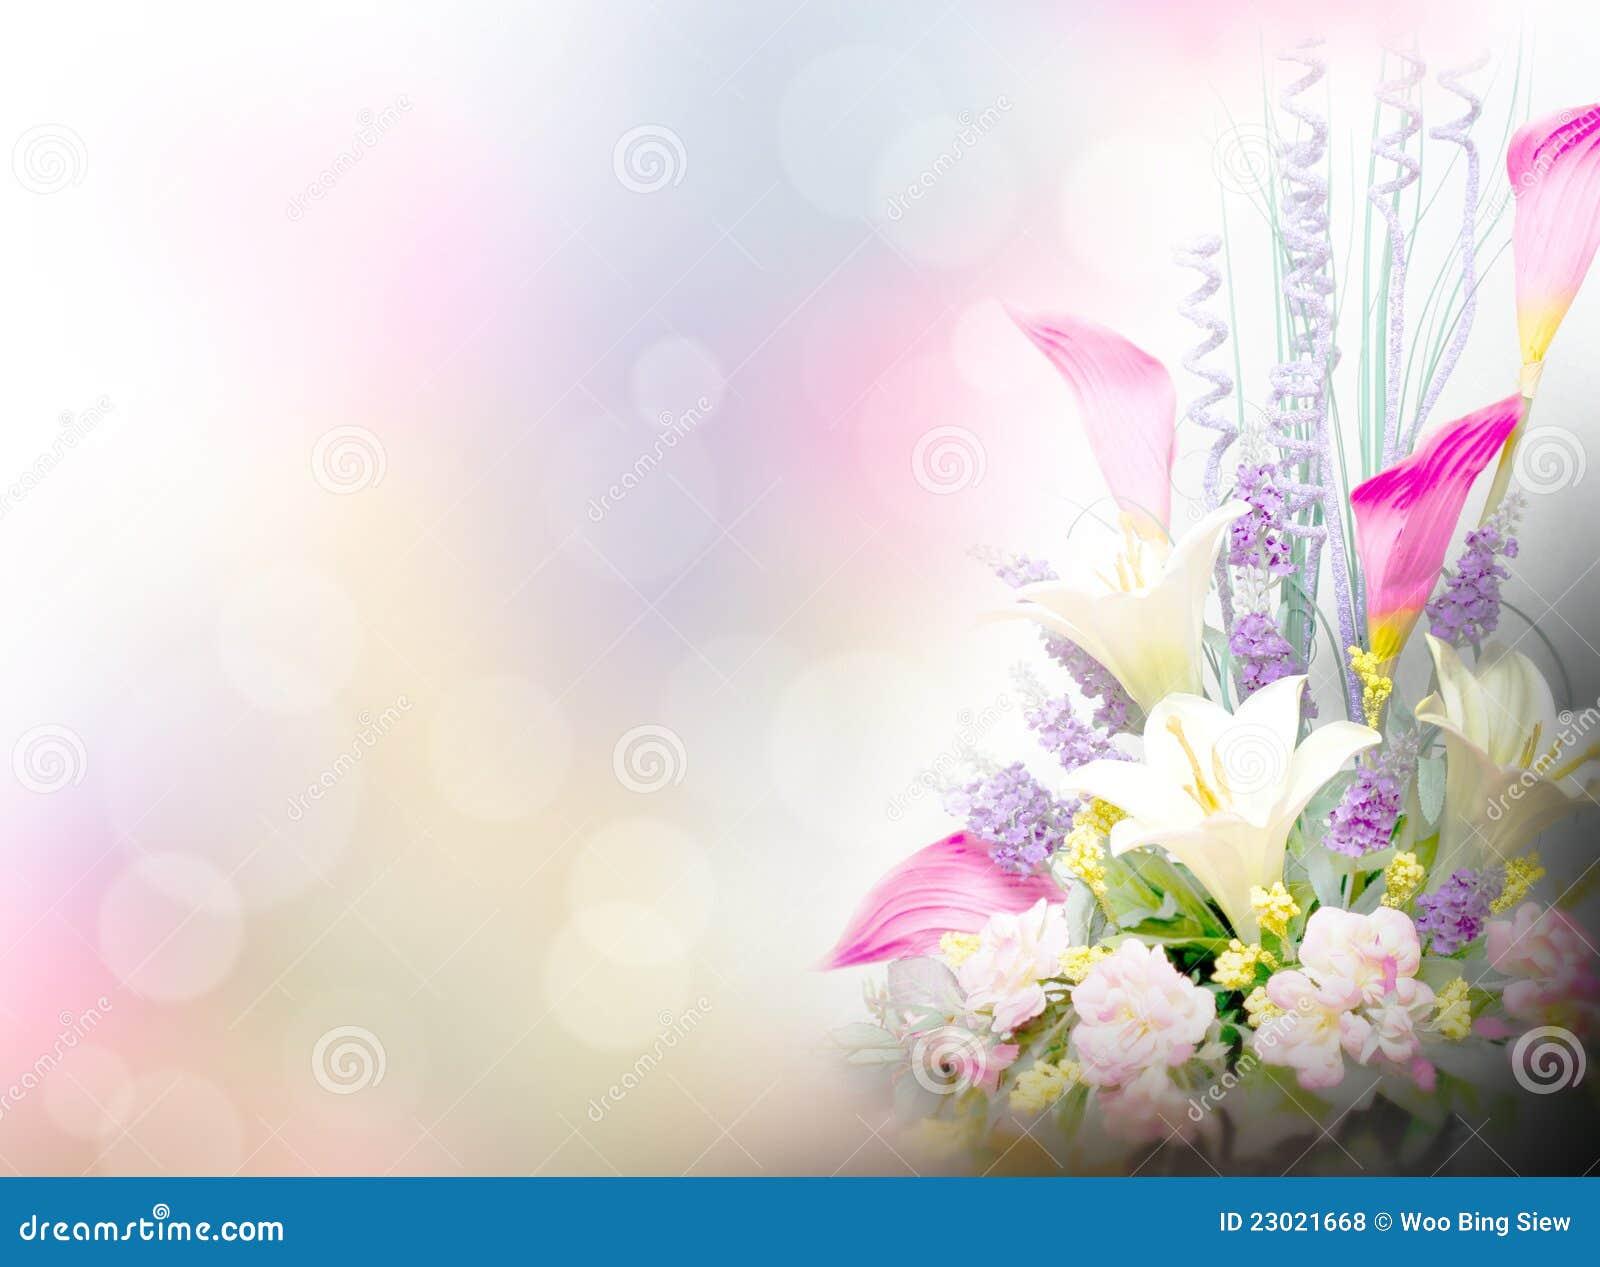 Image Result For Calla Lily Wallpaper Elegant Calla Lily Wallpapers Hd Wallpapers Id